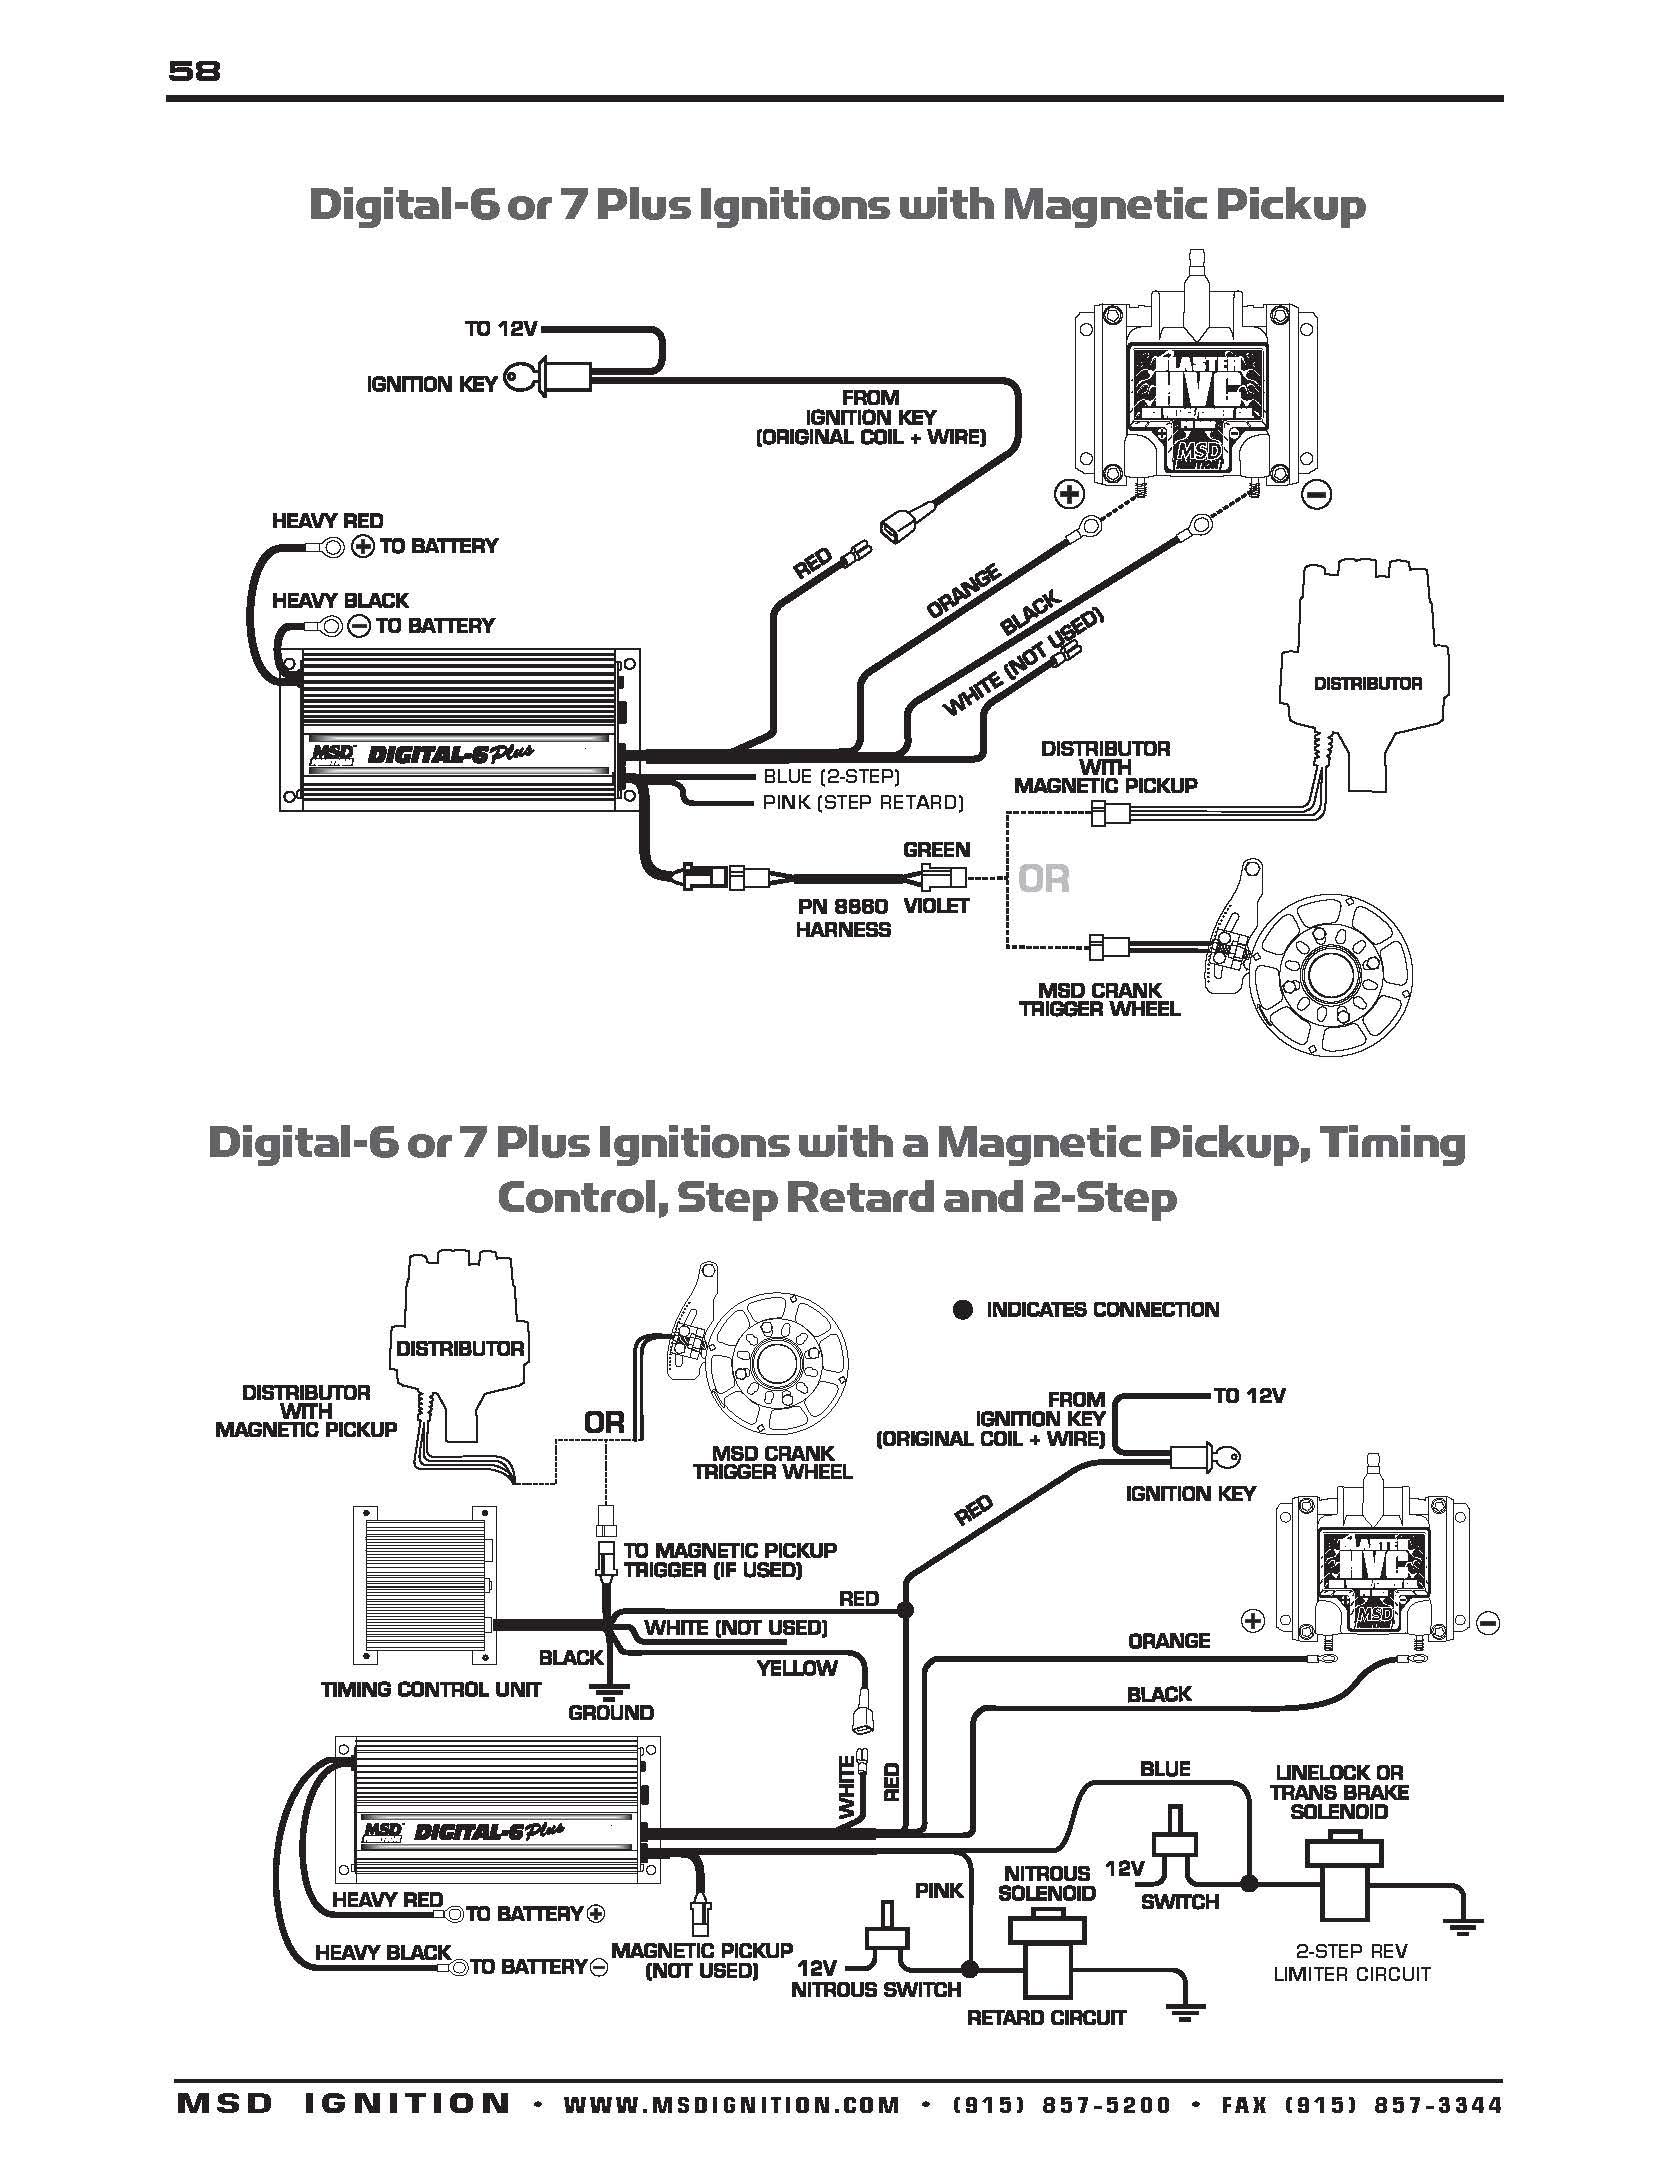 Tremendous Ford Msd Wiring Diagram Basic Electronics Wiring Diagram Wiring Cloud Timewinrebemohammedshrineorg